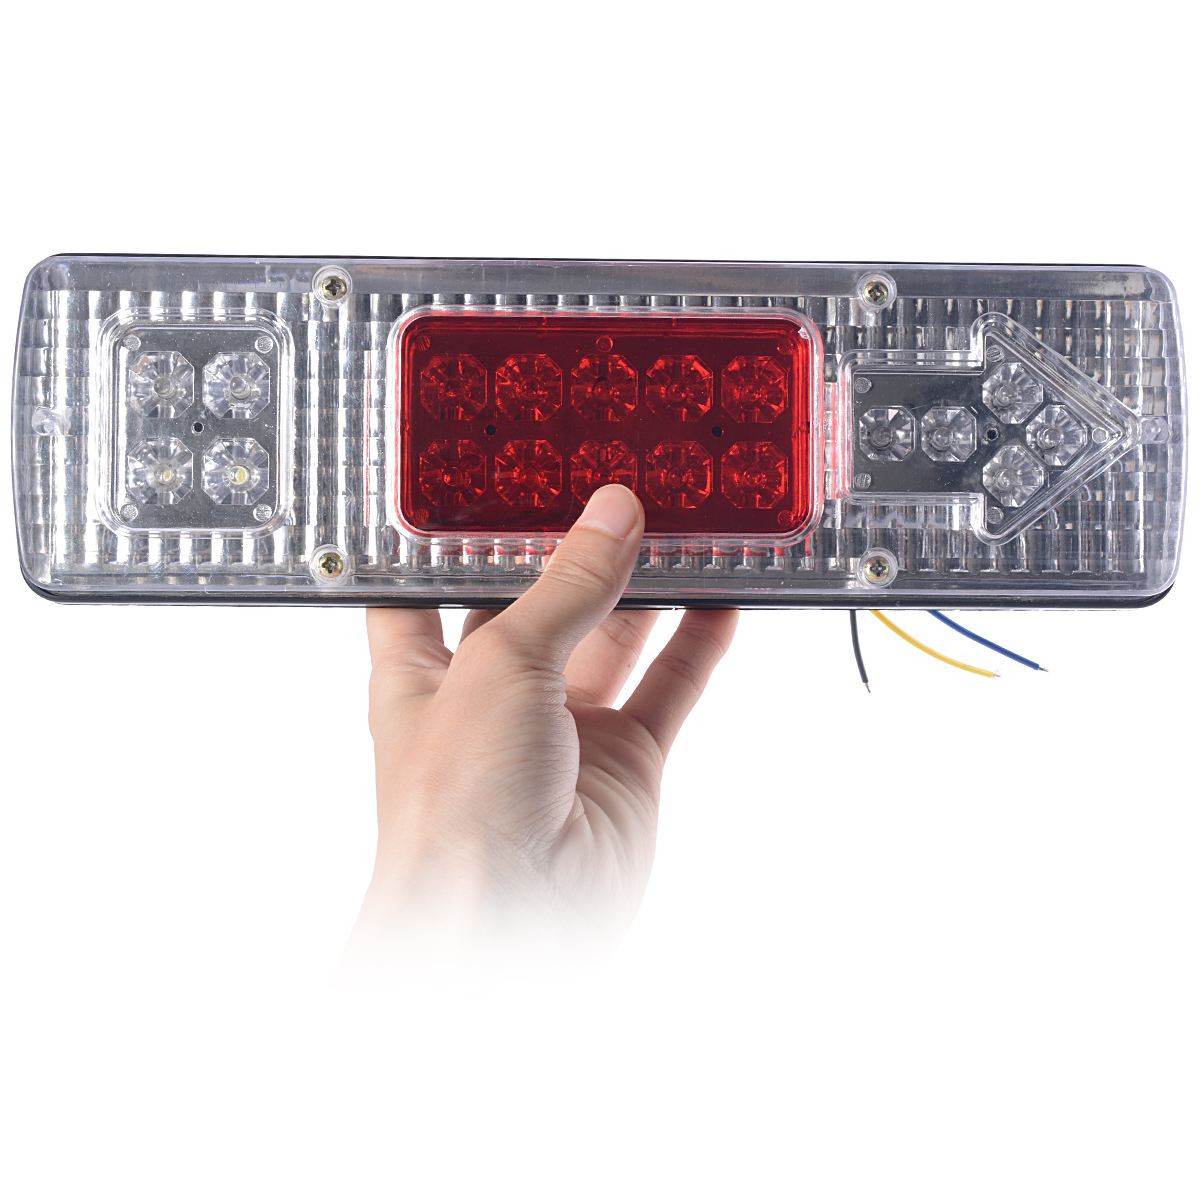 2X 19 LED Rear turn Signal Trailer Truck RV ATV Turn Signal Running Tail Brake Light Bright car styling MA149(China (Mainland))